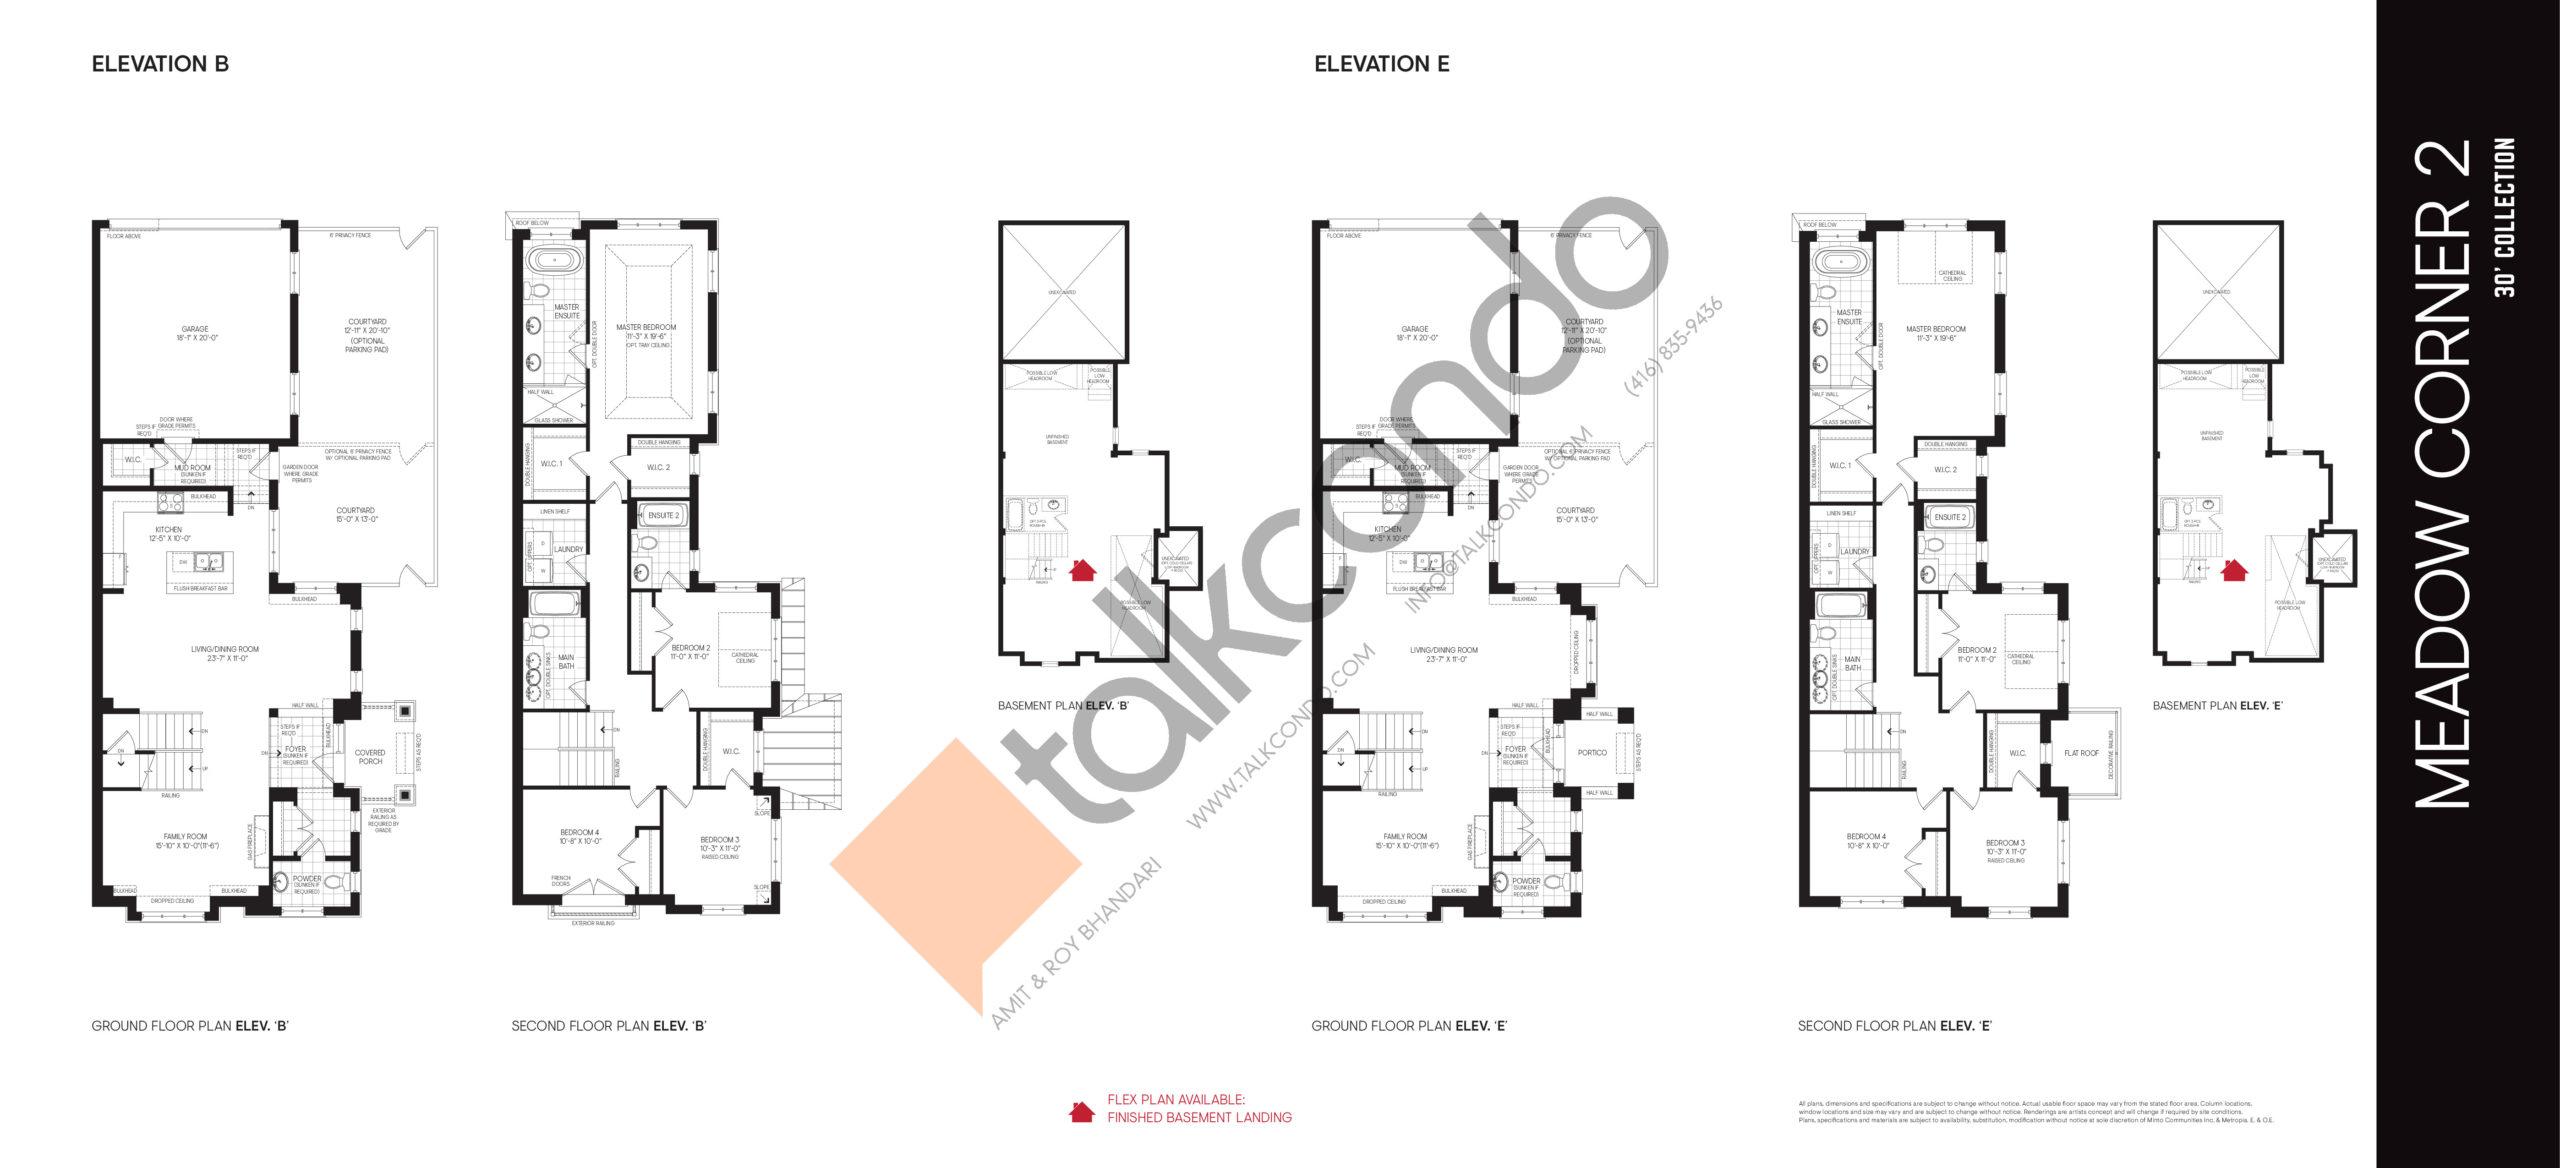 Meadow Corner 2 Elev B / Elev E - 30' Collection Floor Plan at Union Village - 2496 sq.ft